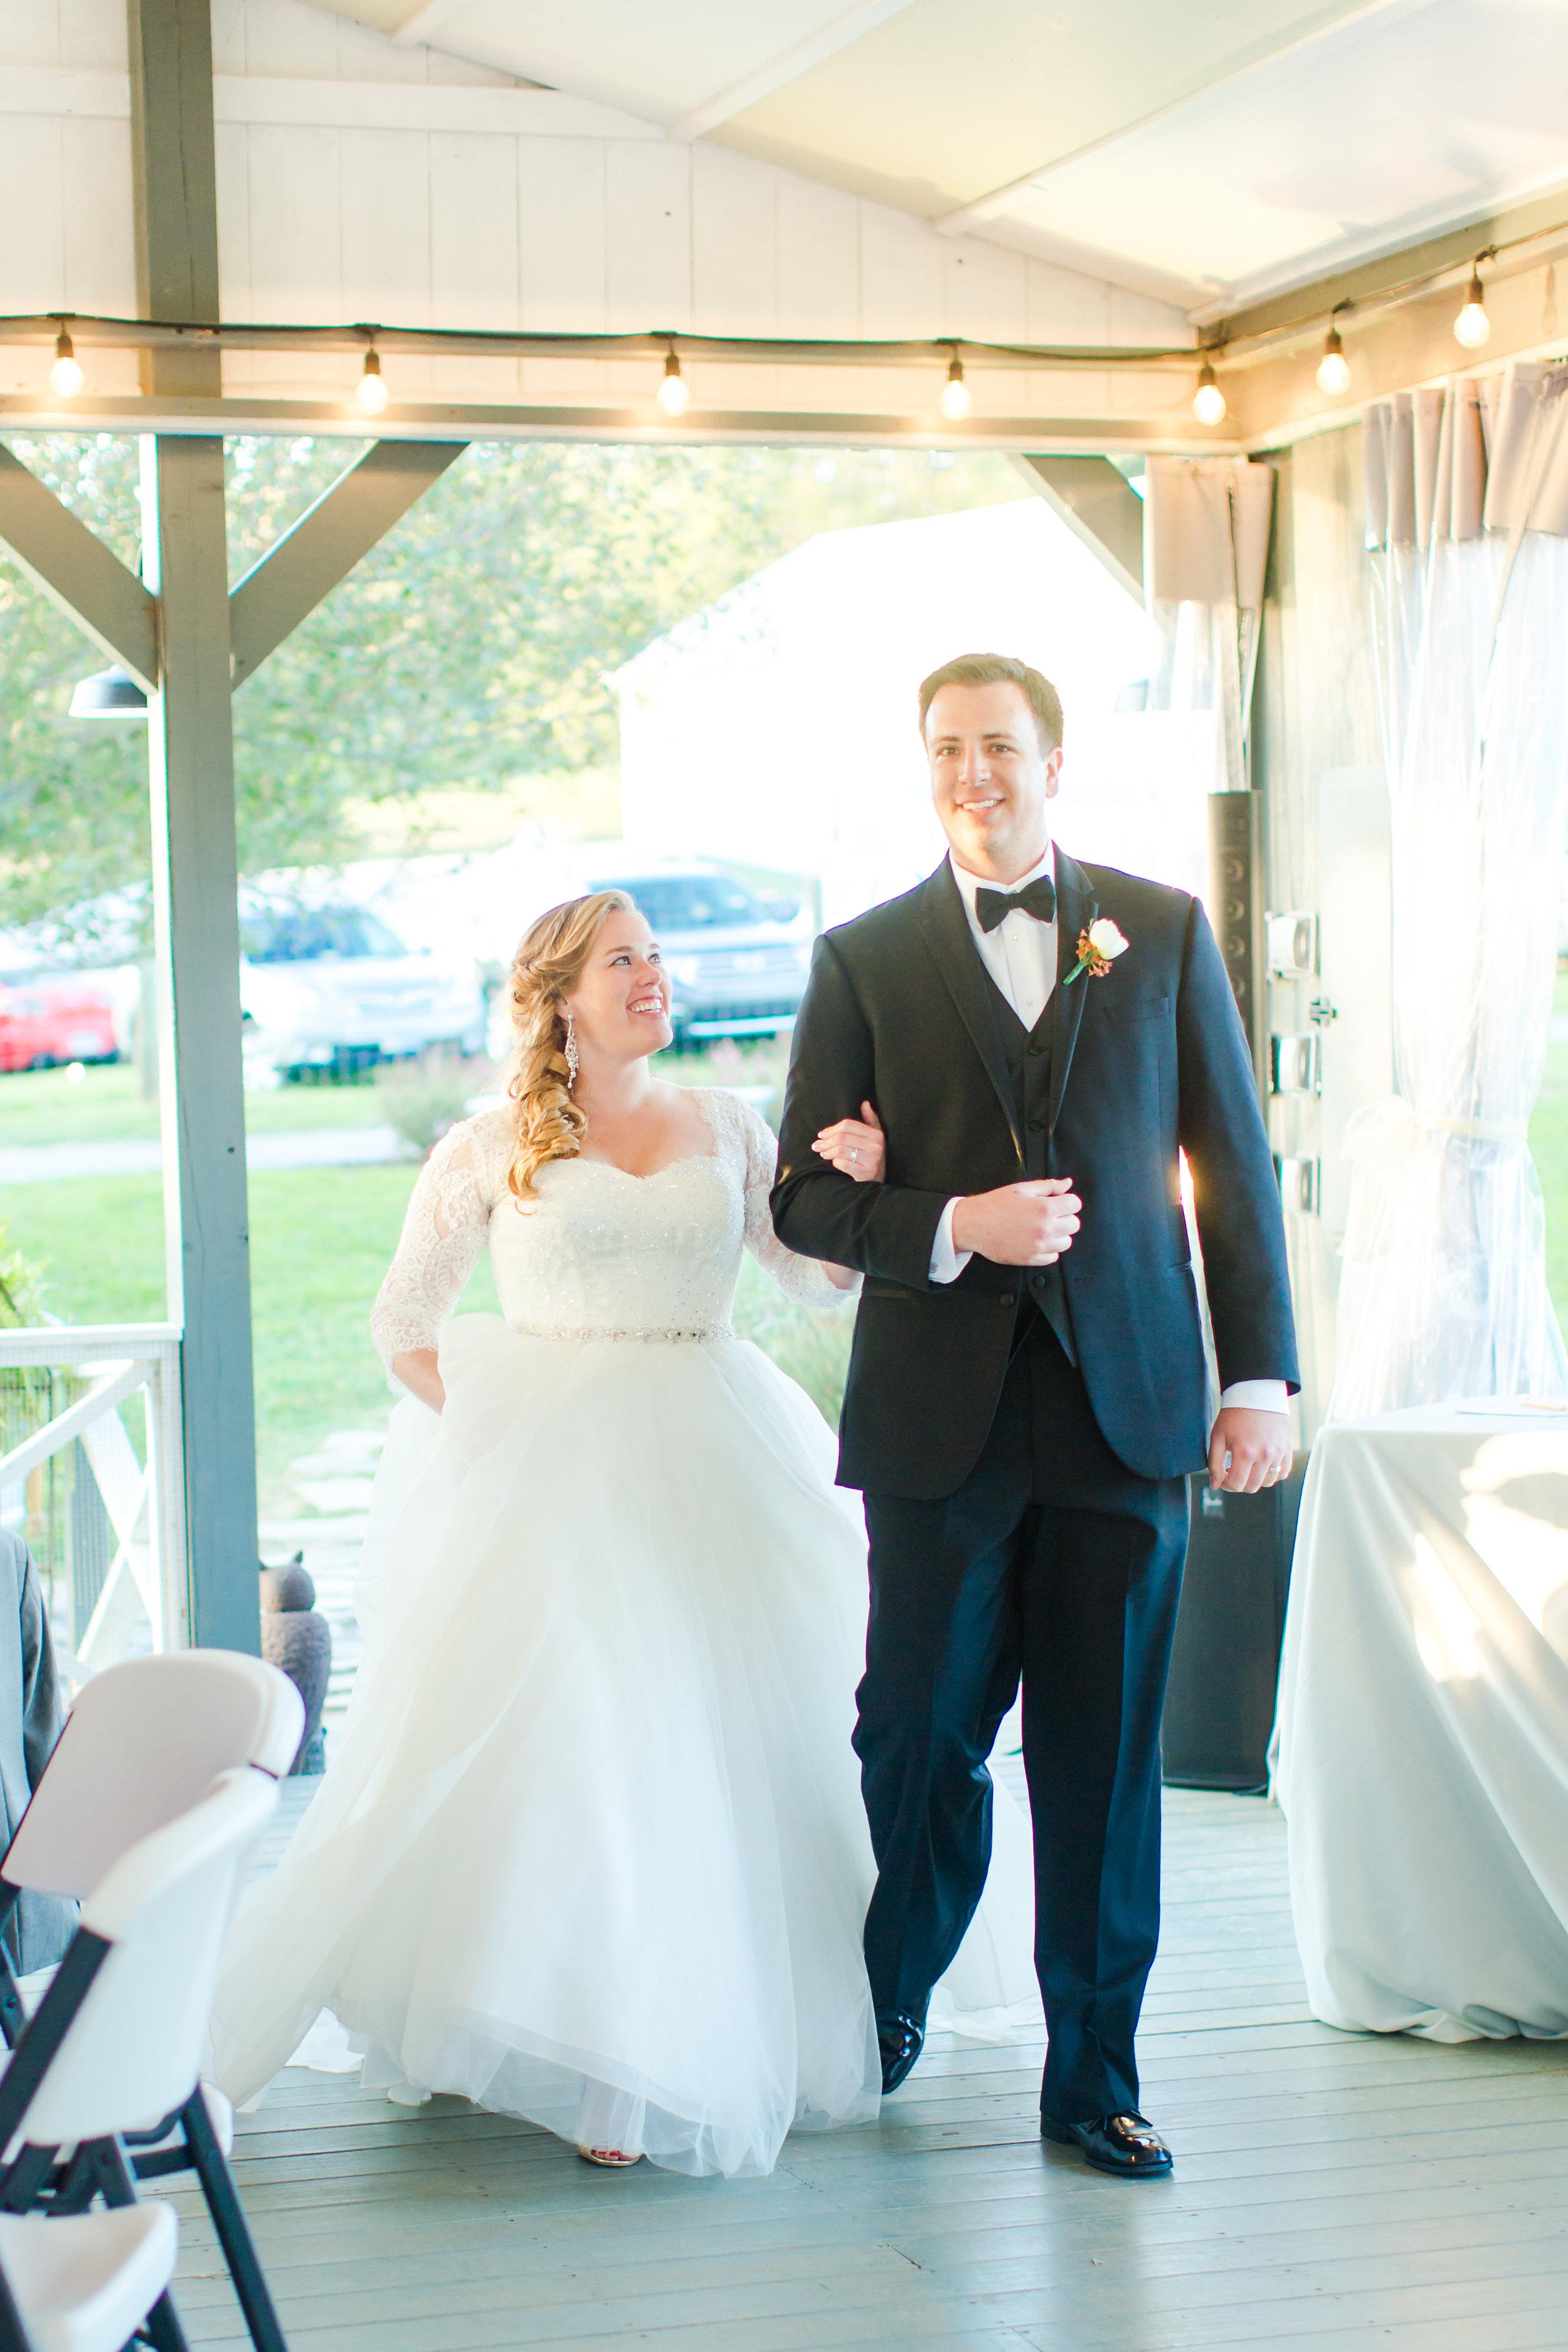 dv entertainment charlottesville wedding staunton wedding gaie lea wedding DJ eric and lindsay bride groom entrance